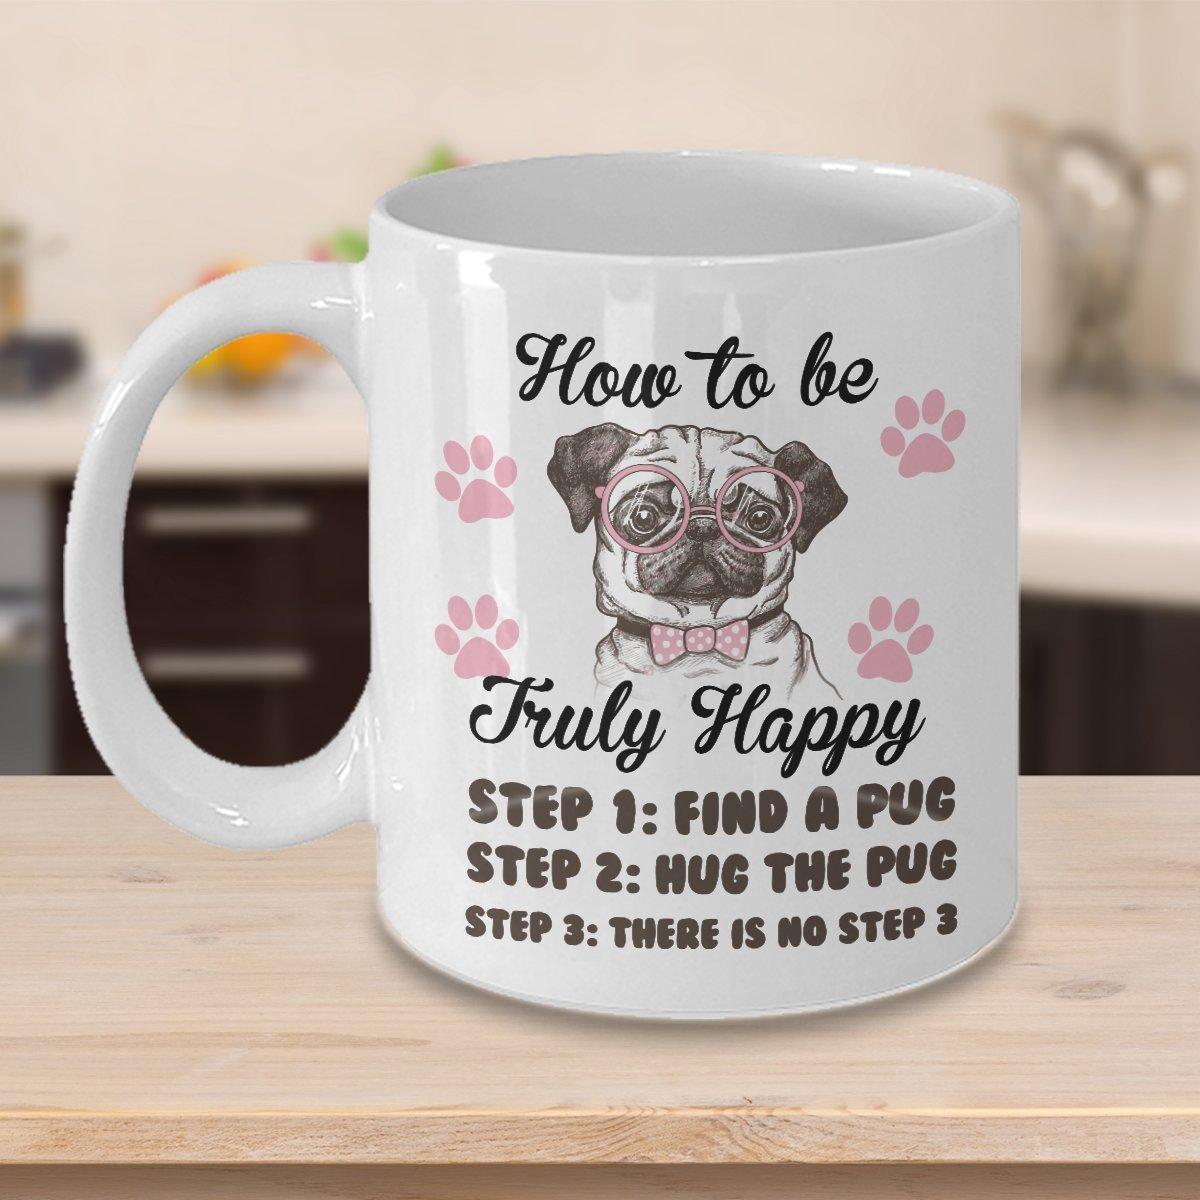 TeesCloset Funny Gift for Pug Lovers - Funny Pug Mugs - Cute Coffee Mugs for Pug Owners